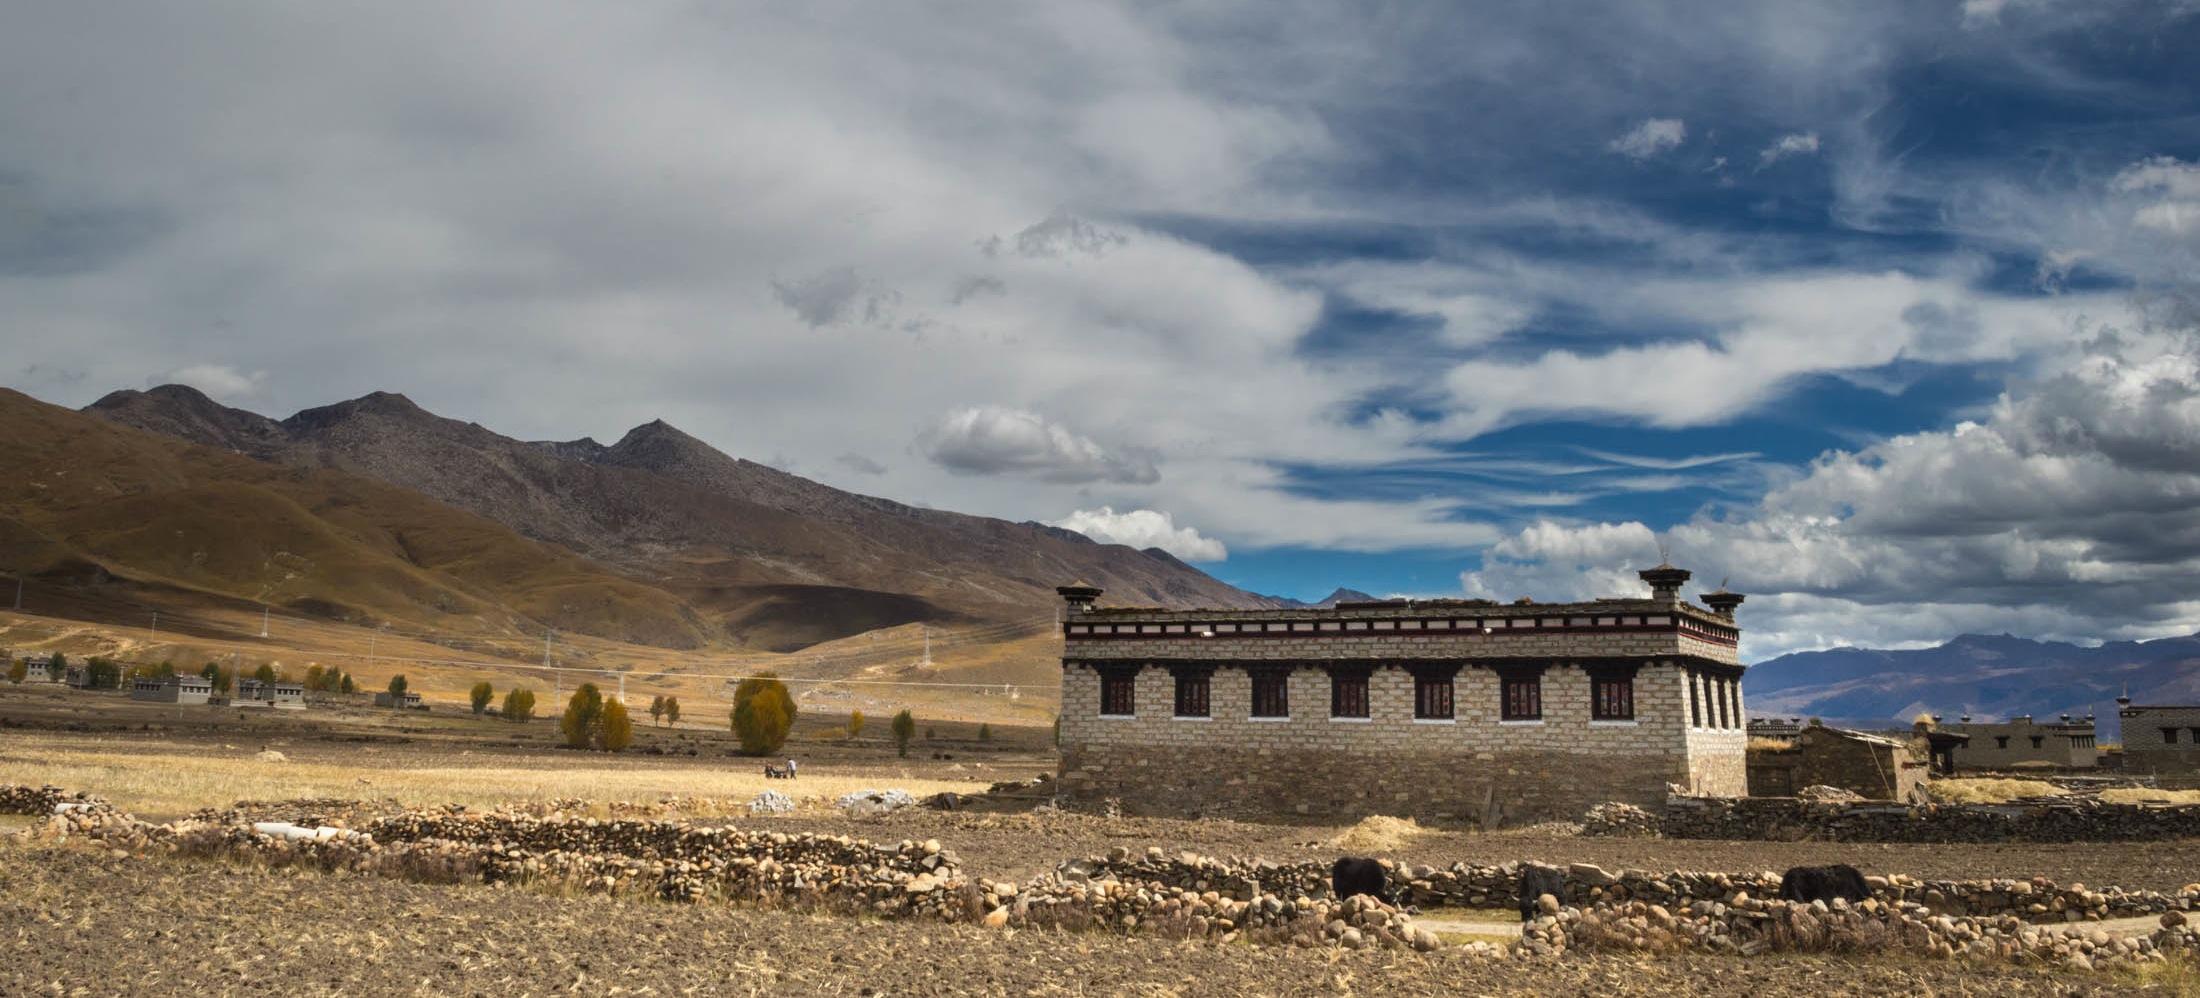 "Lunch at a Tibetan ""Castle"" in Daocheng"